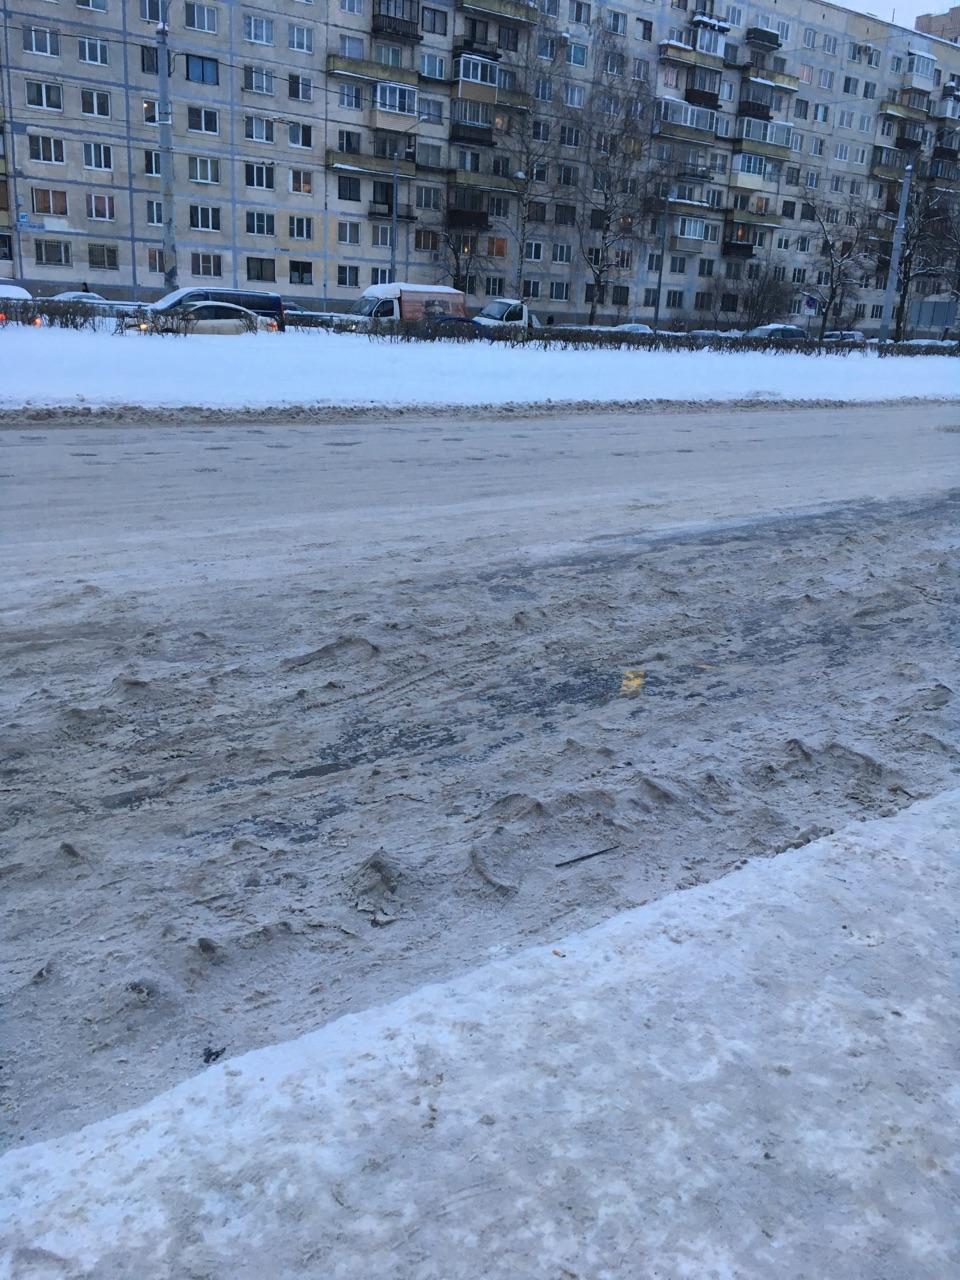 жалобы петербуржцев на неубранный снег